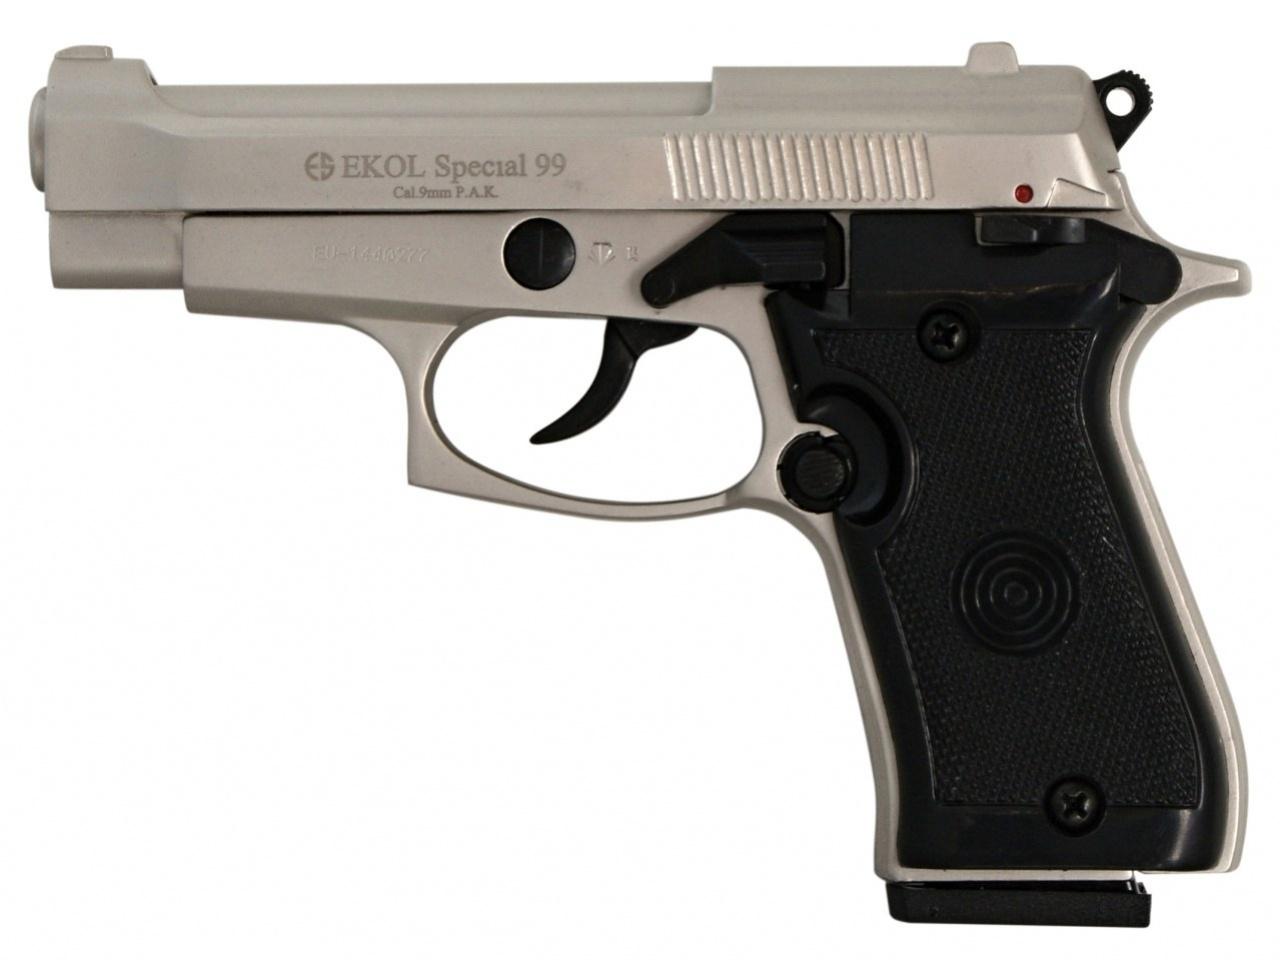 Pistolet gazowy Ekol Special 99 satyn nikiel kal.9mm